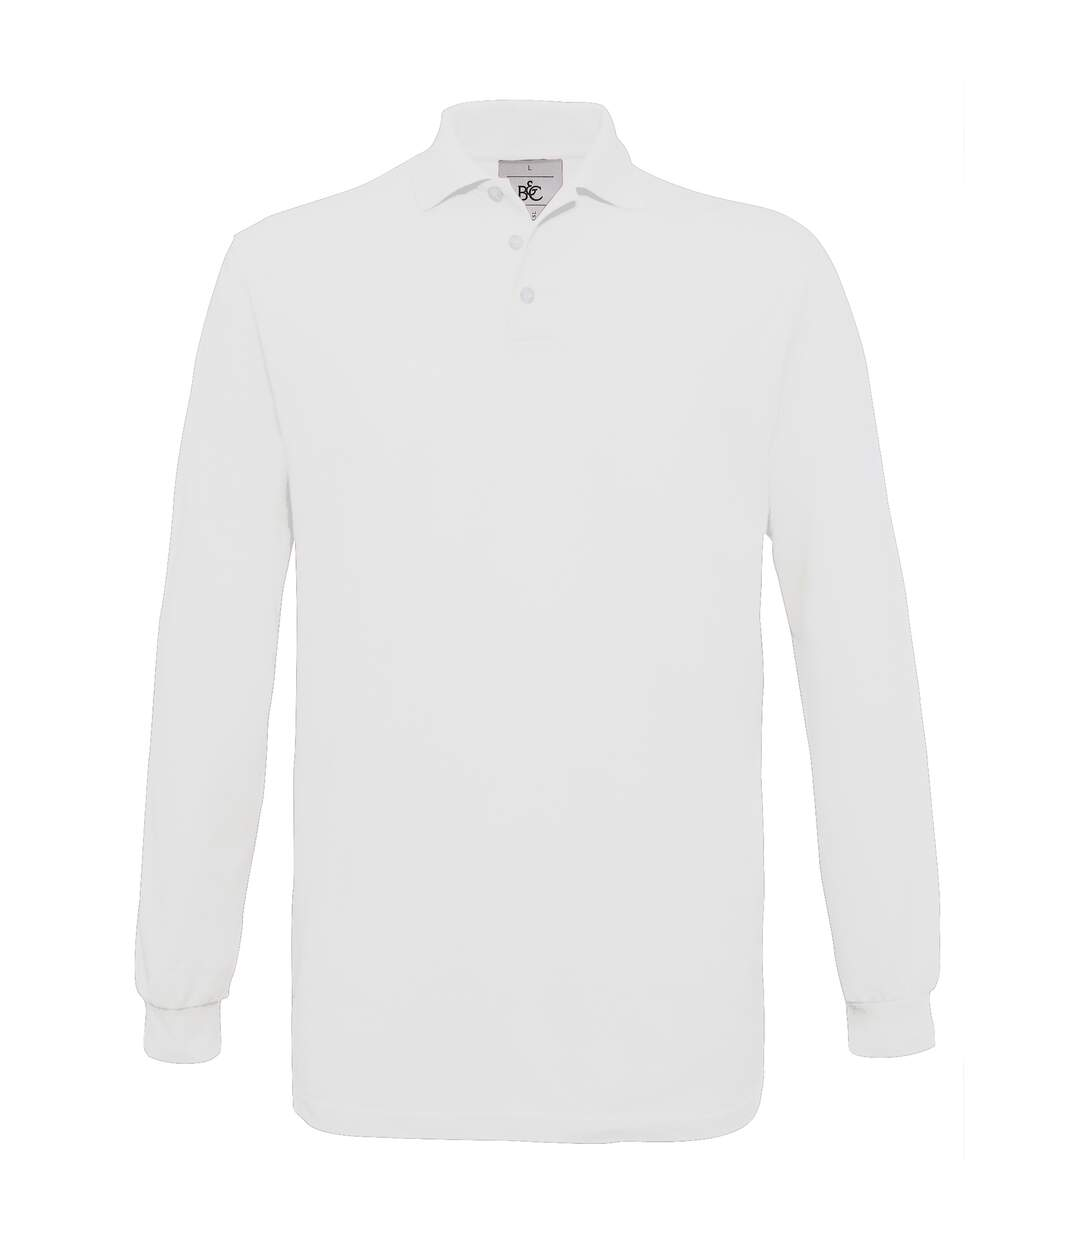 B&C Mens Safran Long Sleeve Cotton Polo Shirt (Black) - UTRW3005